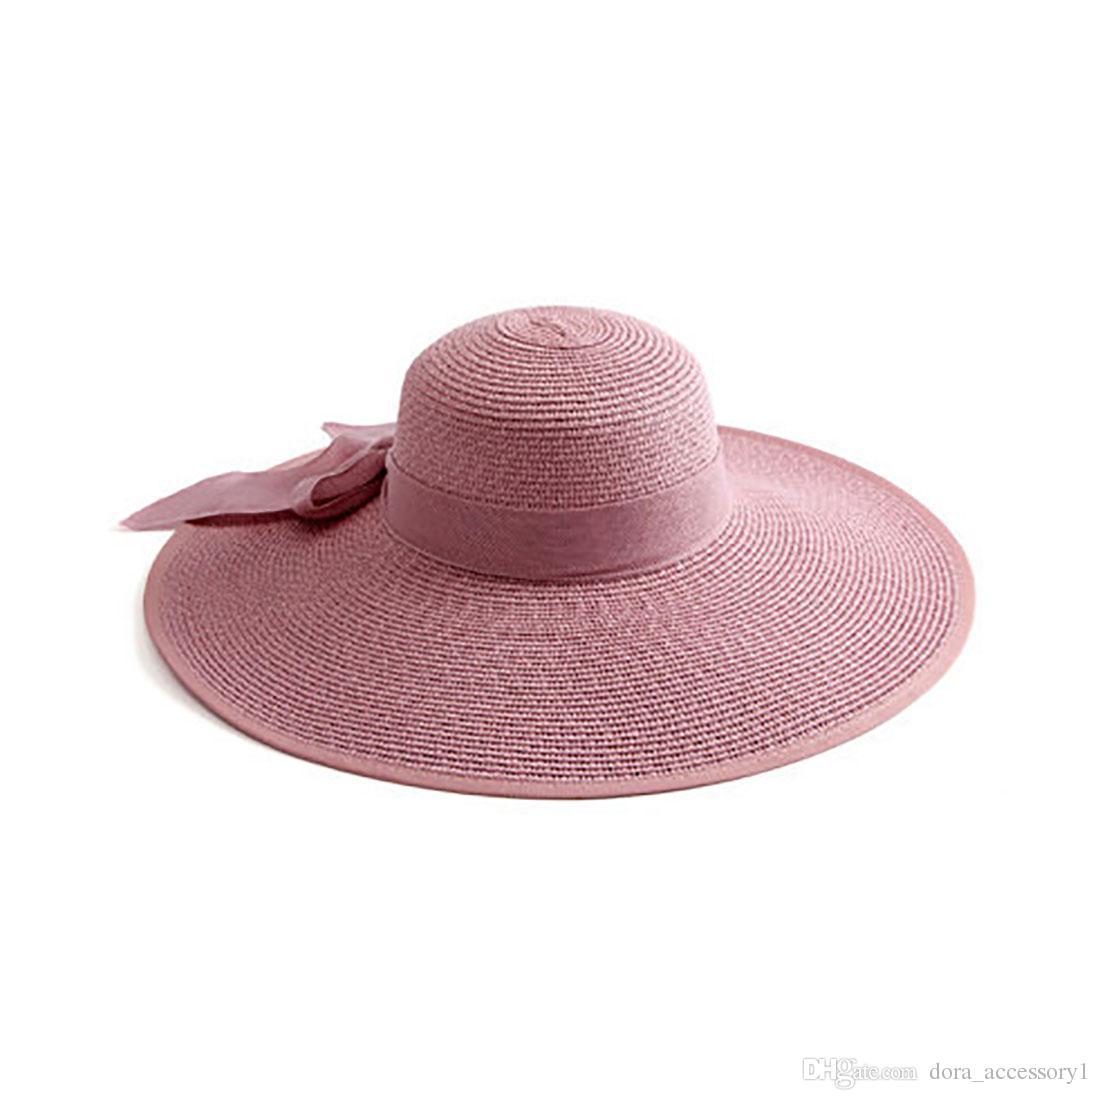 7c3894e7a0cb4b Dora Women Summer Round Flat Top Straw Beach Hat Charming Ladies Bowknot Sun  Hat Straw Hat Tilley Hats From Dora_accessory1, $9.04| DHgate.Com